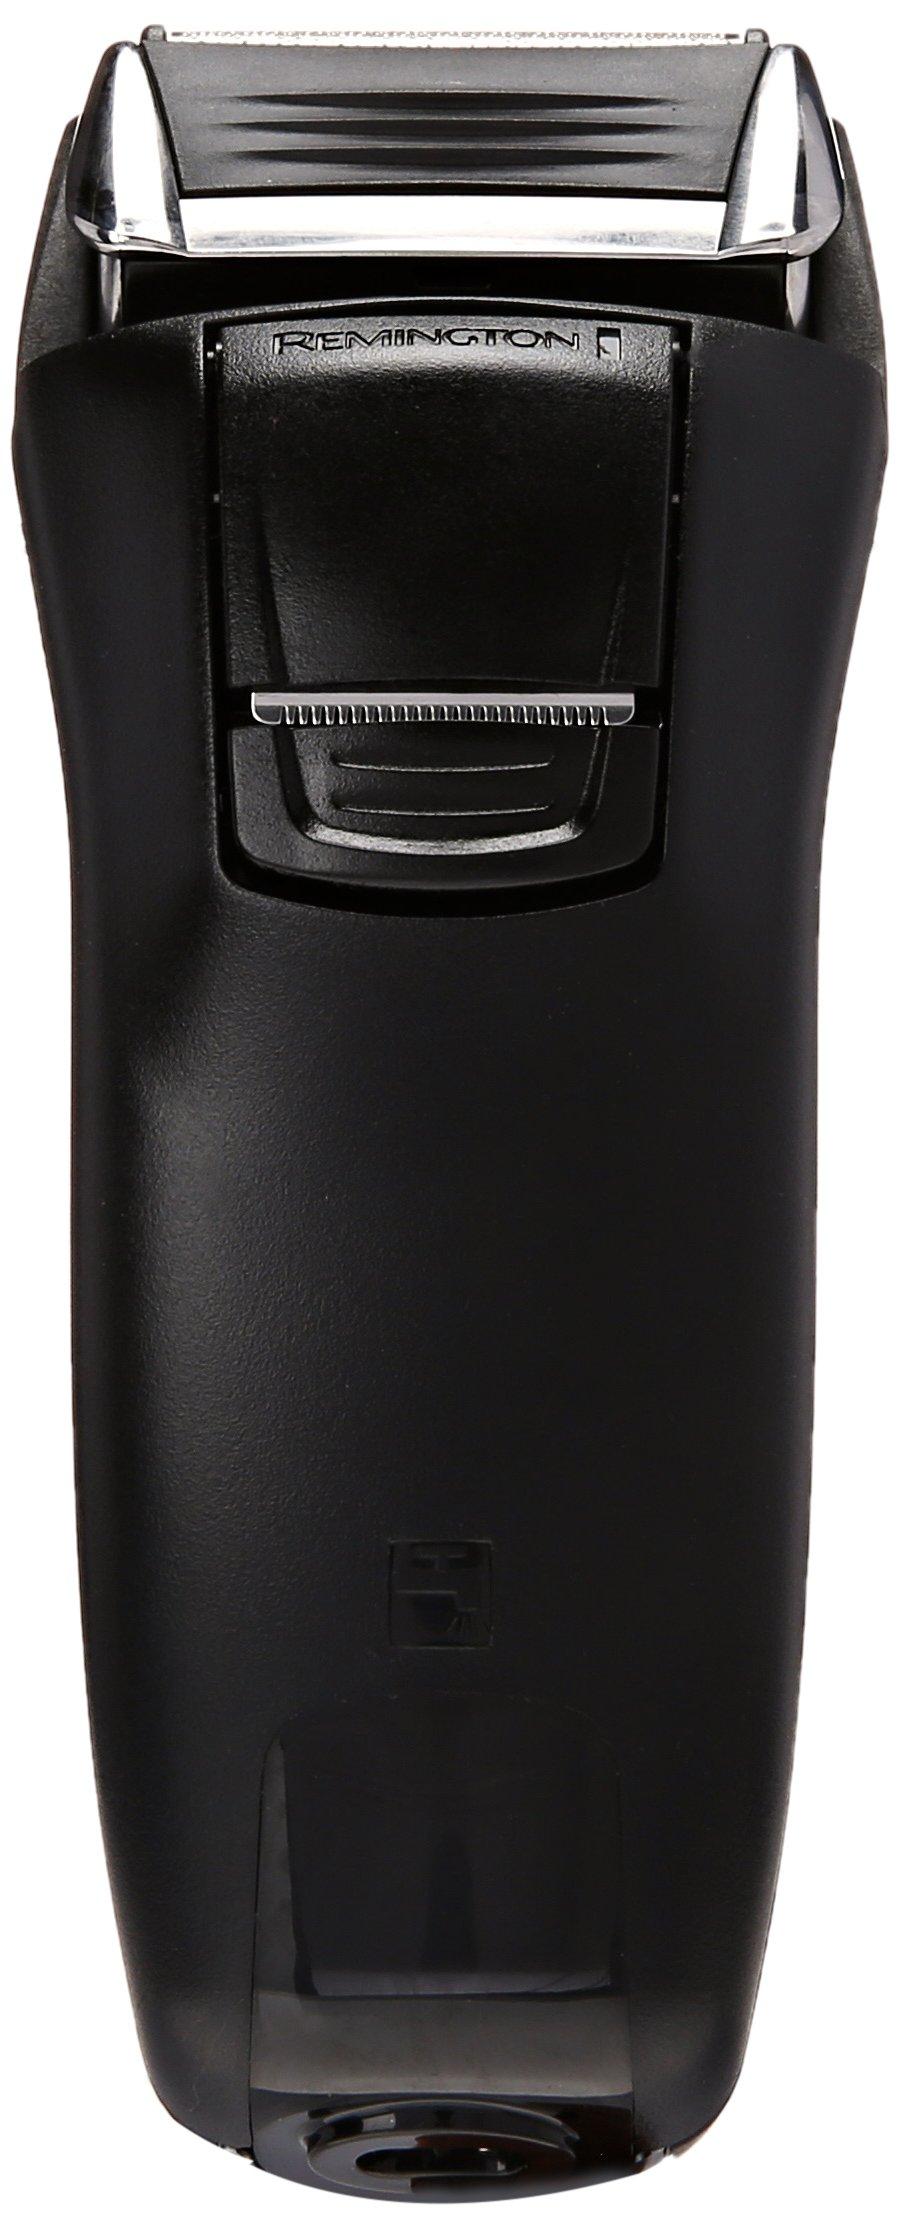 Remington F5-5800 Foil Shaver, Men's Electric Razor, Electric Shaver, Black by Remington (Image #2)